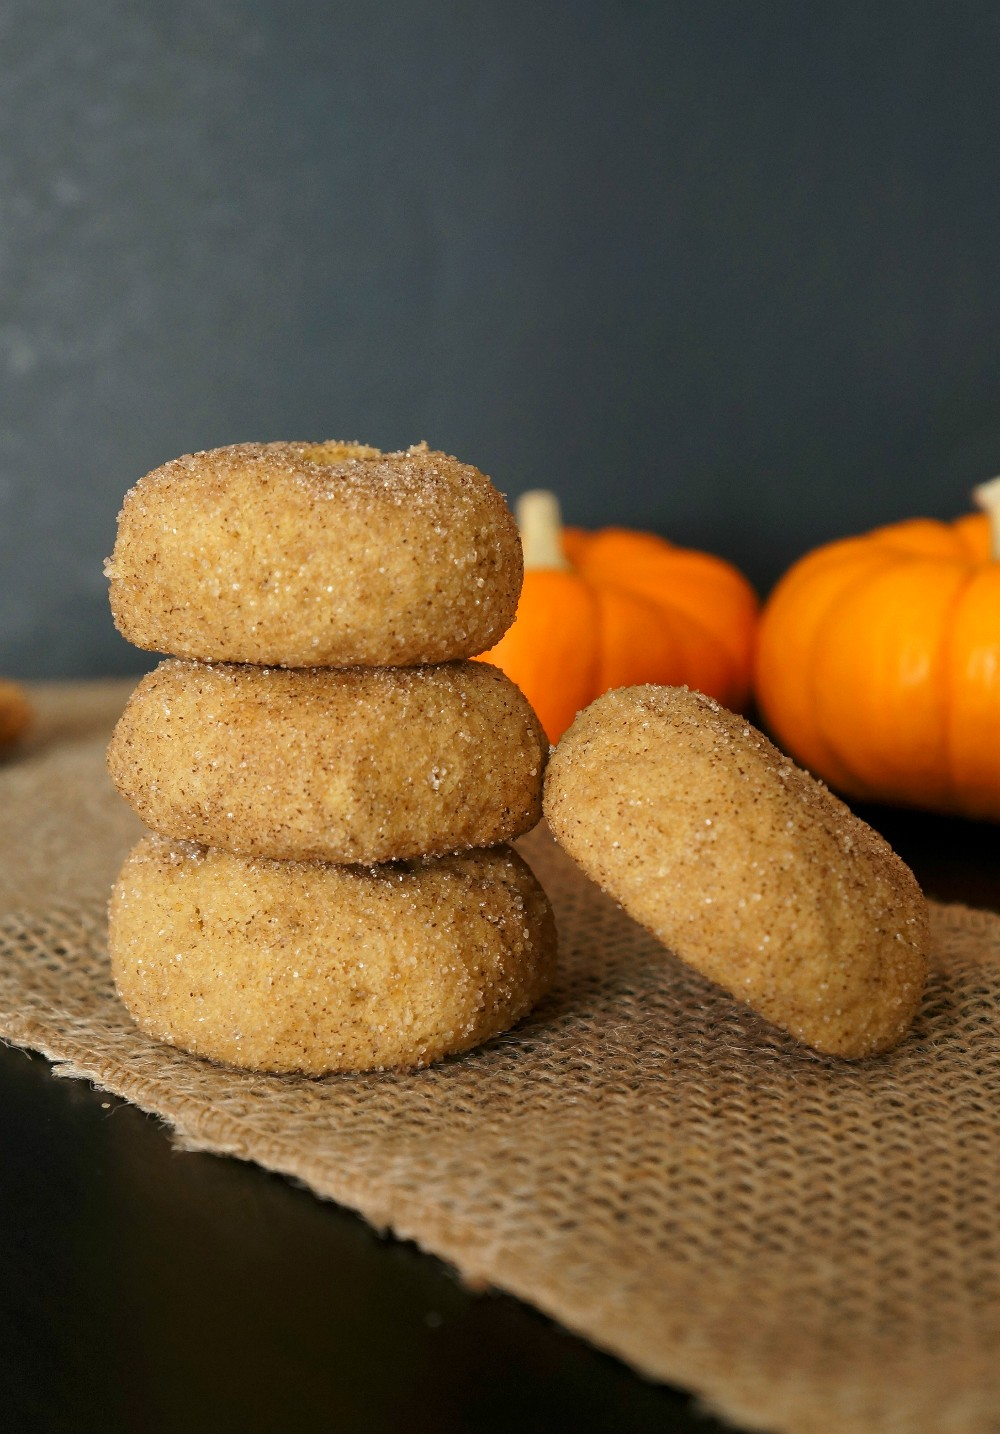 Gluten free pumpkin desserts, pumpkin spice snickerdoodle cookies